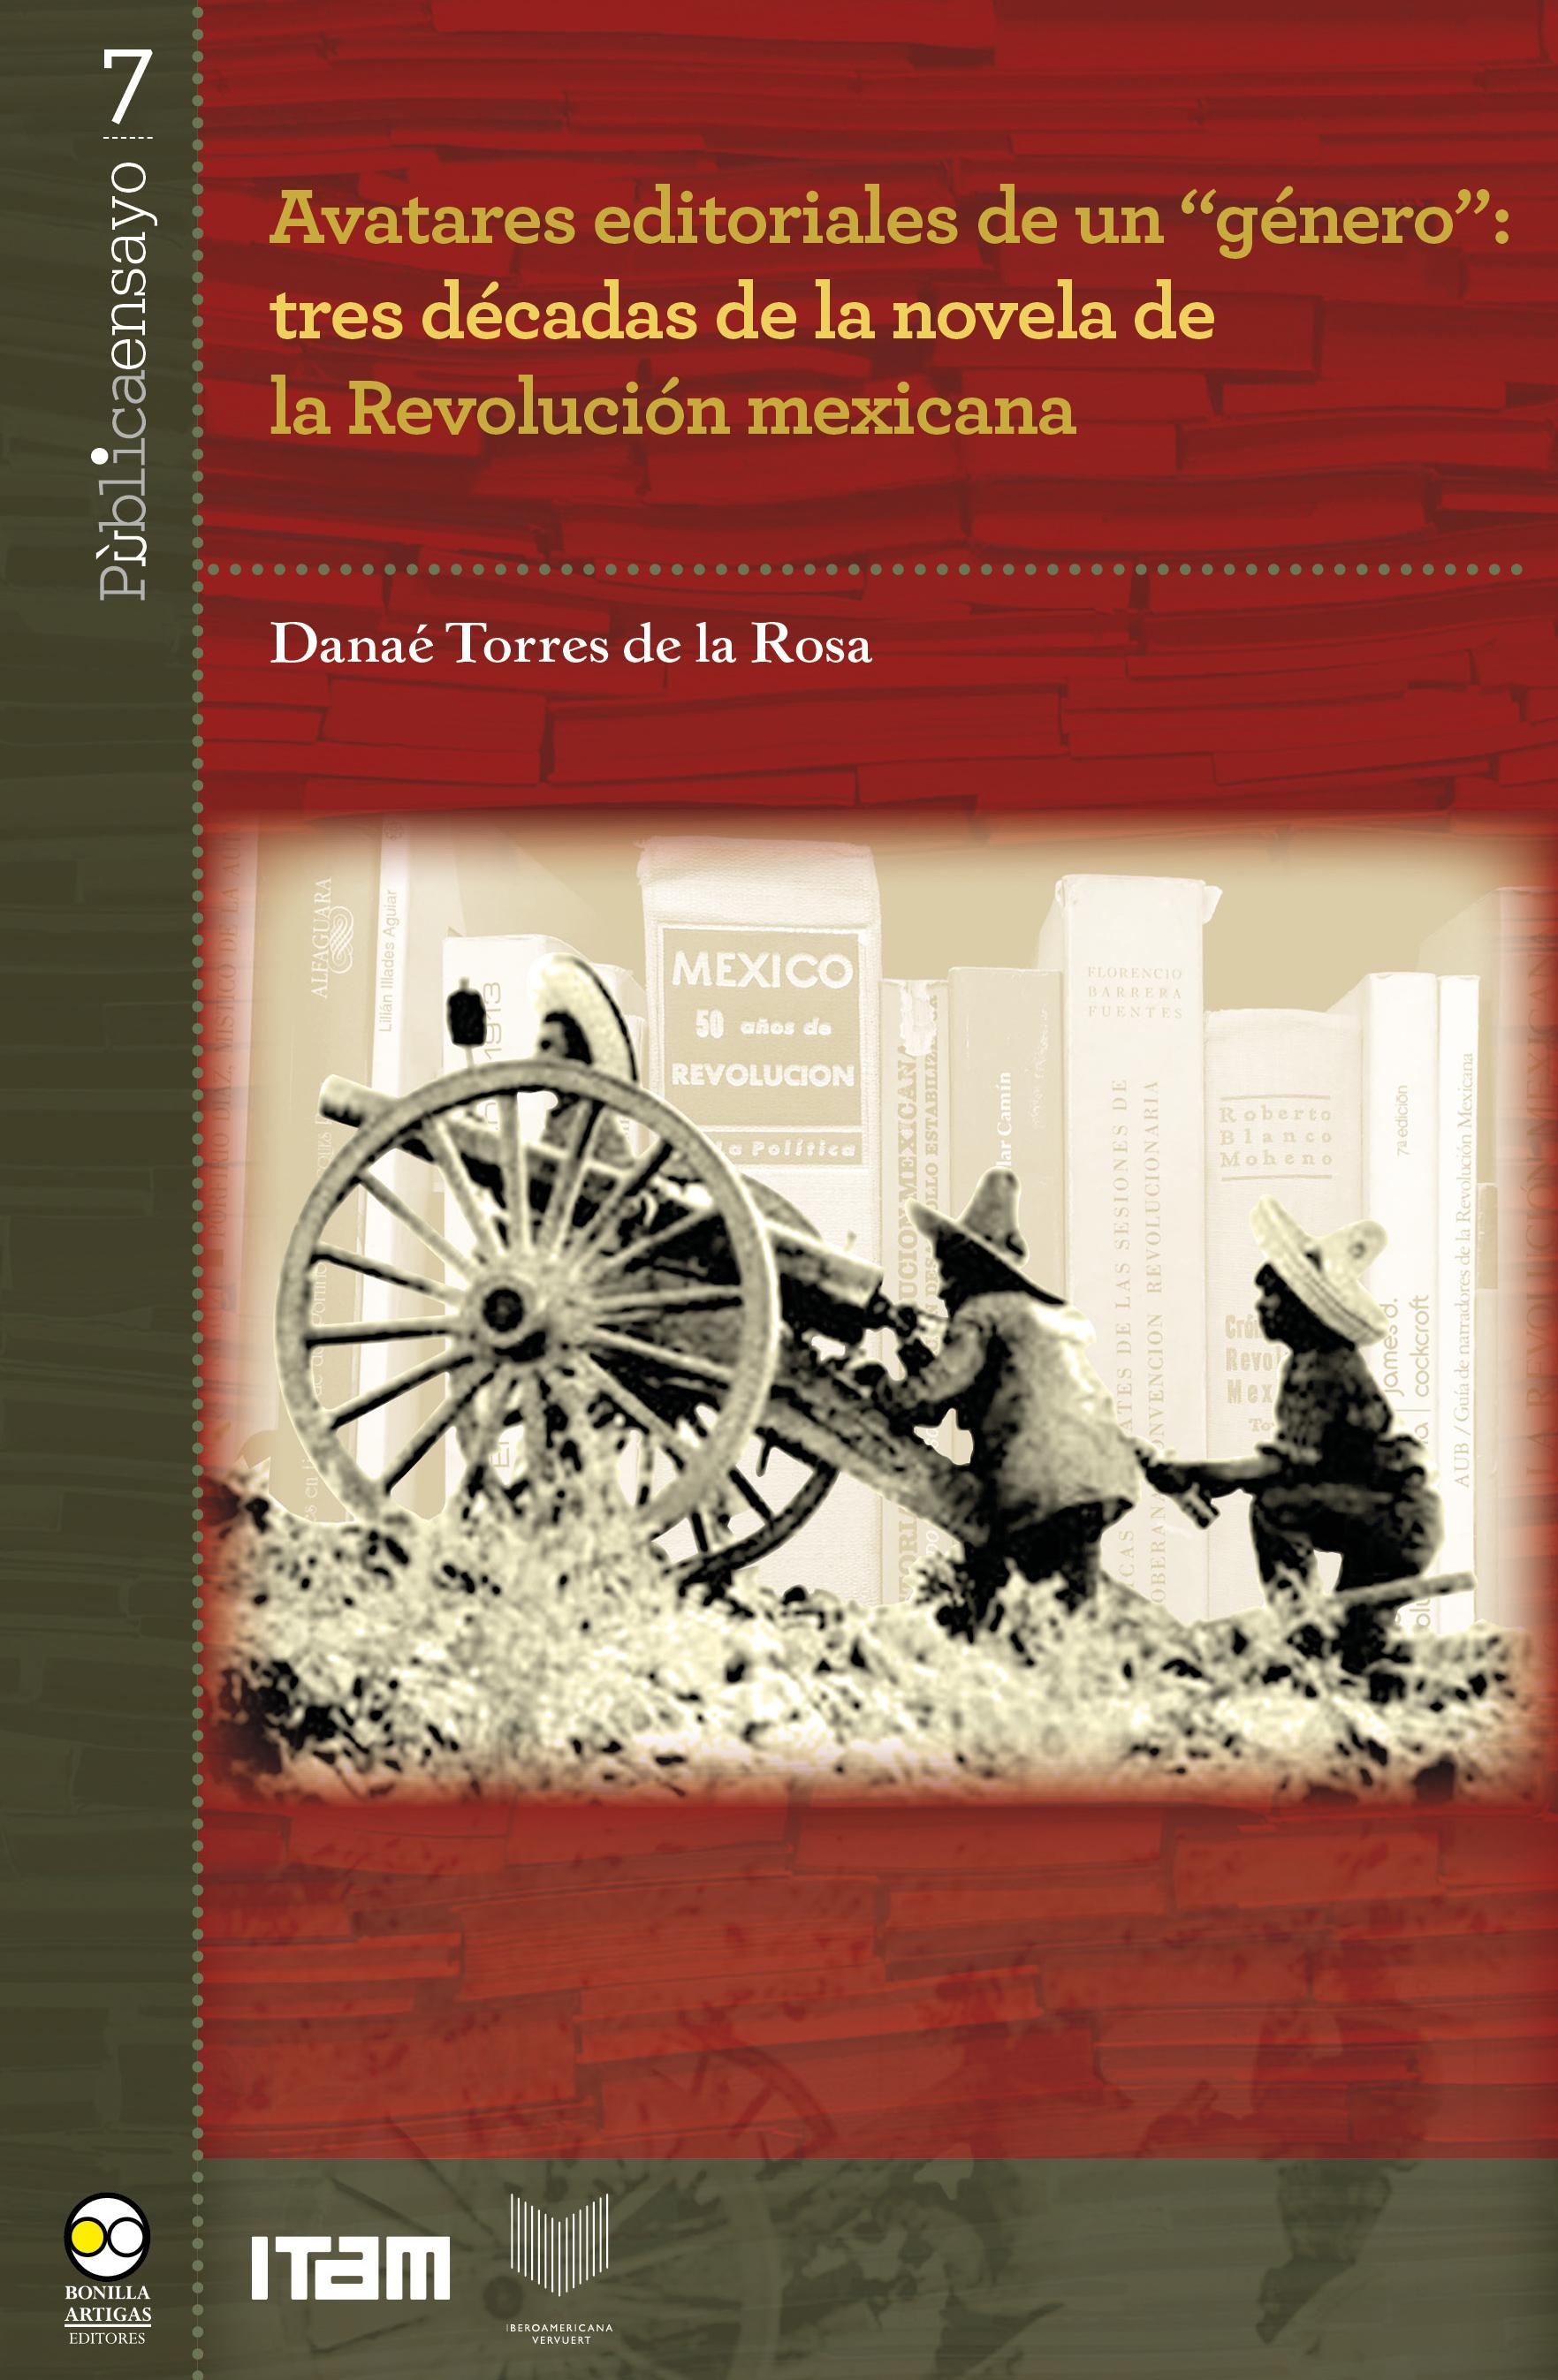 Danaé Torres de la Rosa Avatares editoriales de un género: tres décadas de la novela de la Revolución mexicana